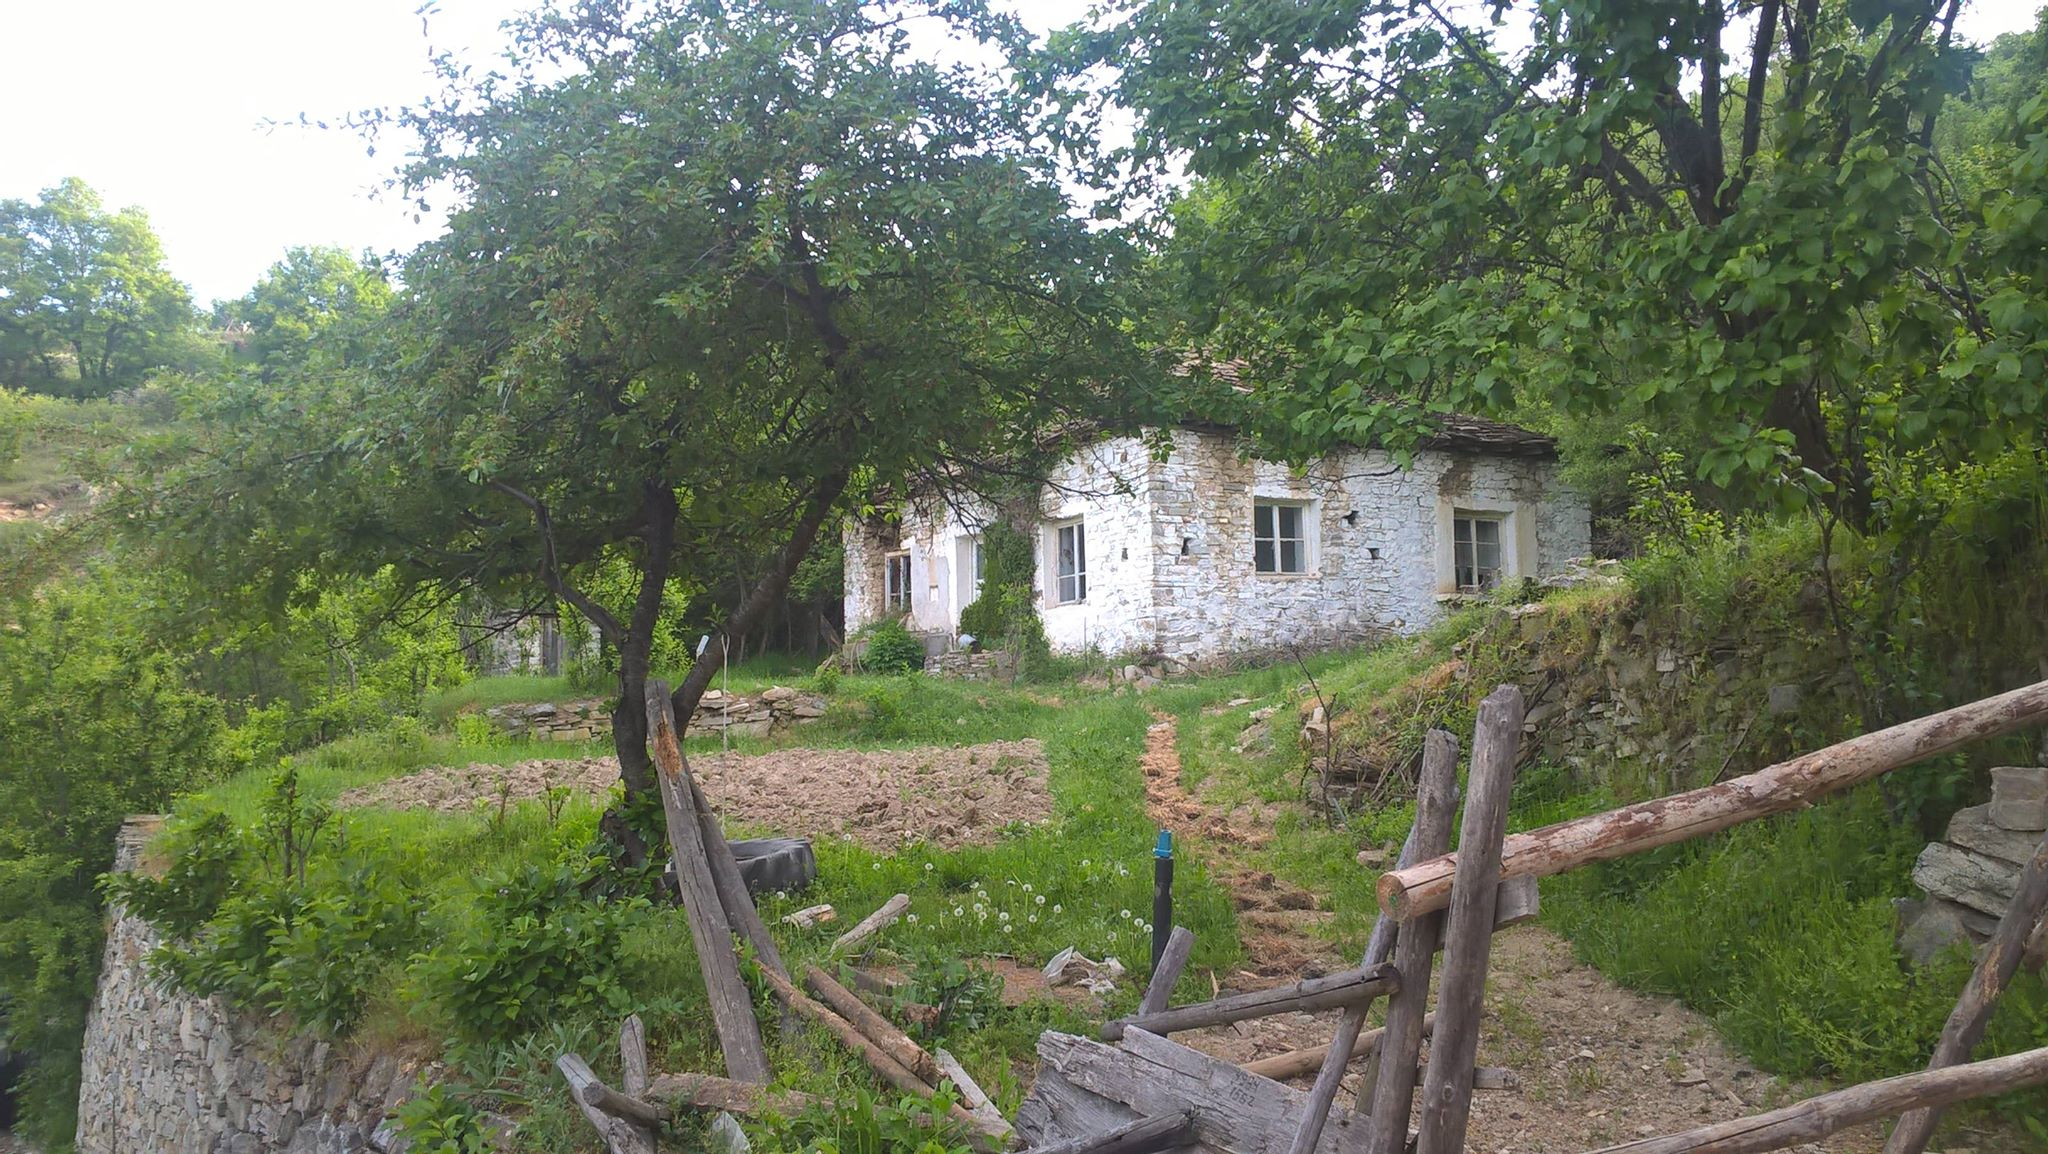 Село Крибул – дом на древност и магия